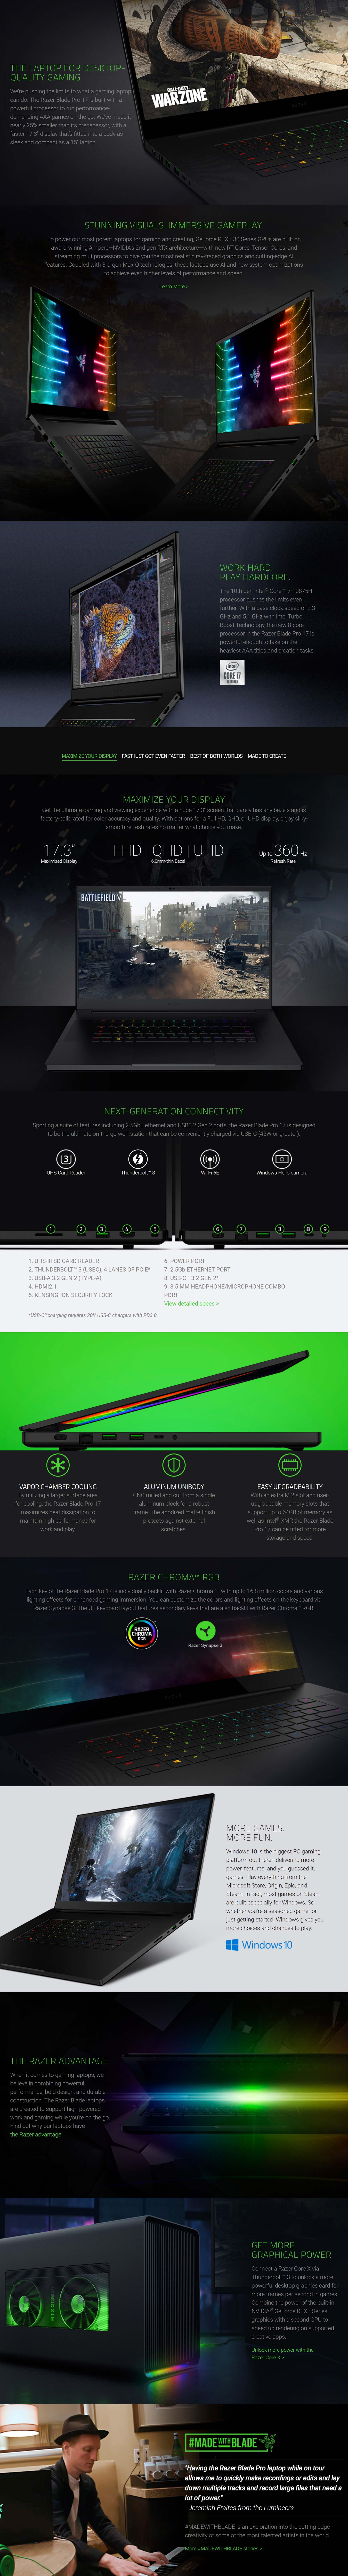 screencapture-www2-razer-au-en-gaming-systems-razer-blade-pro-2021-04-14-13_17_23.jpg